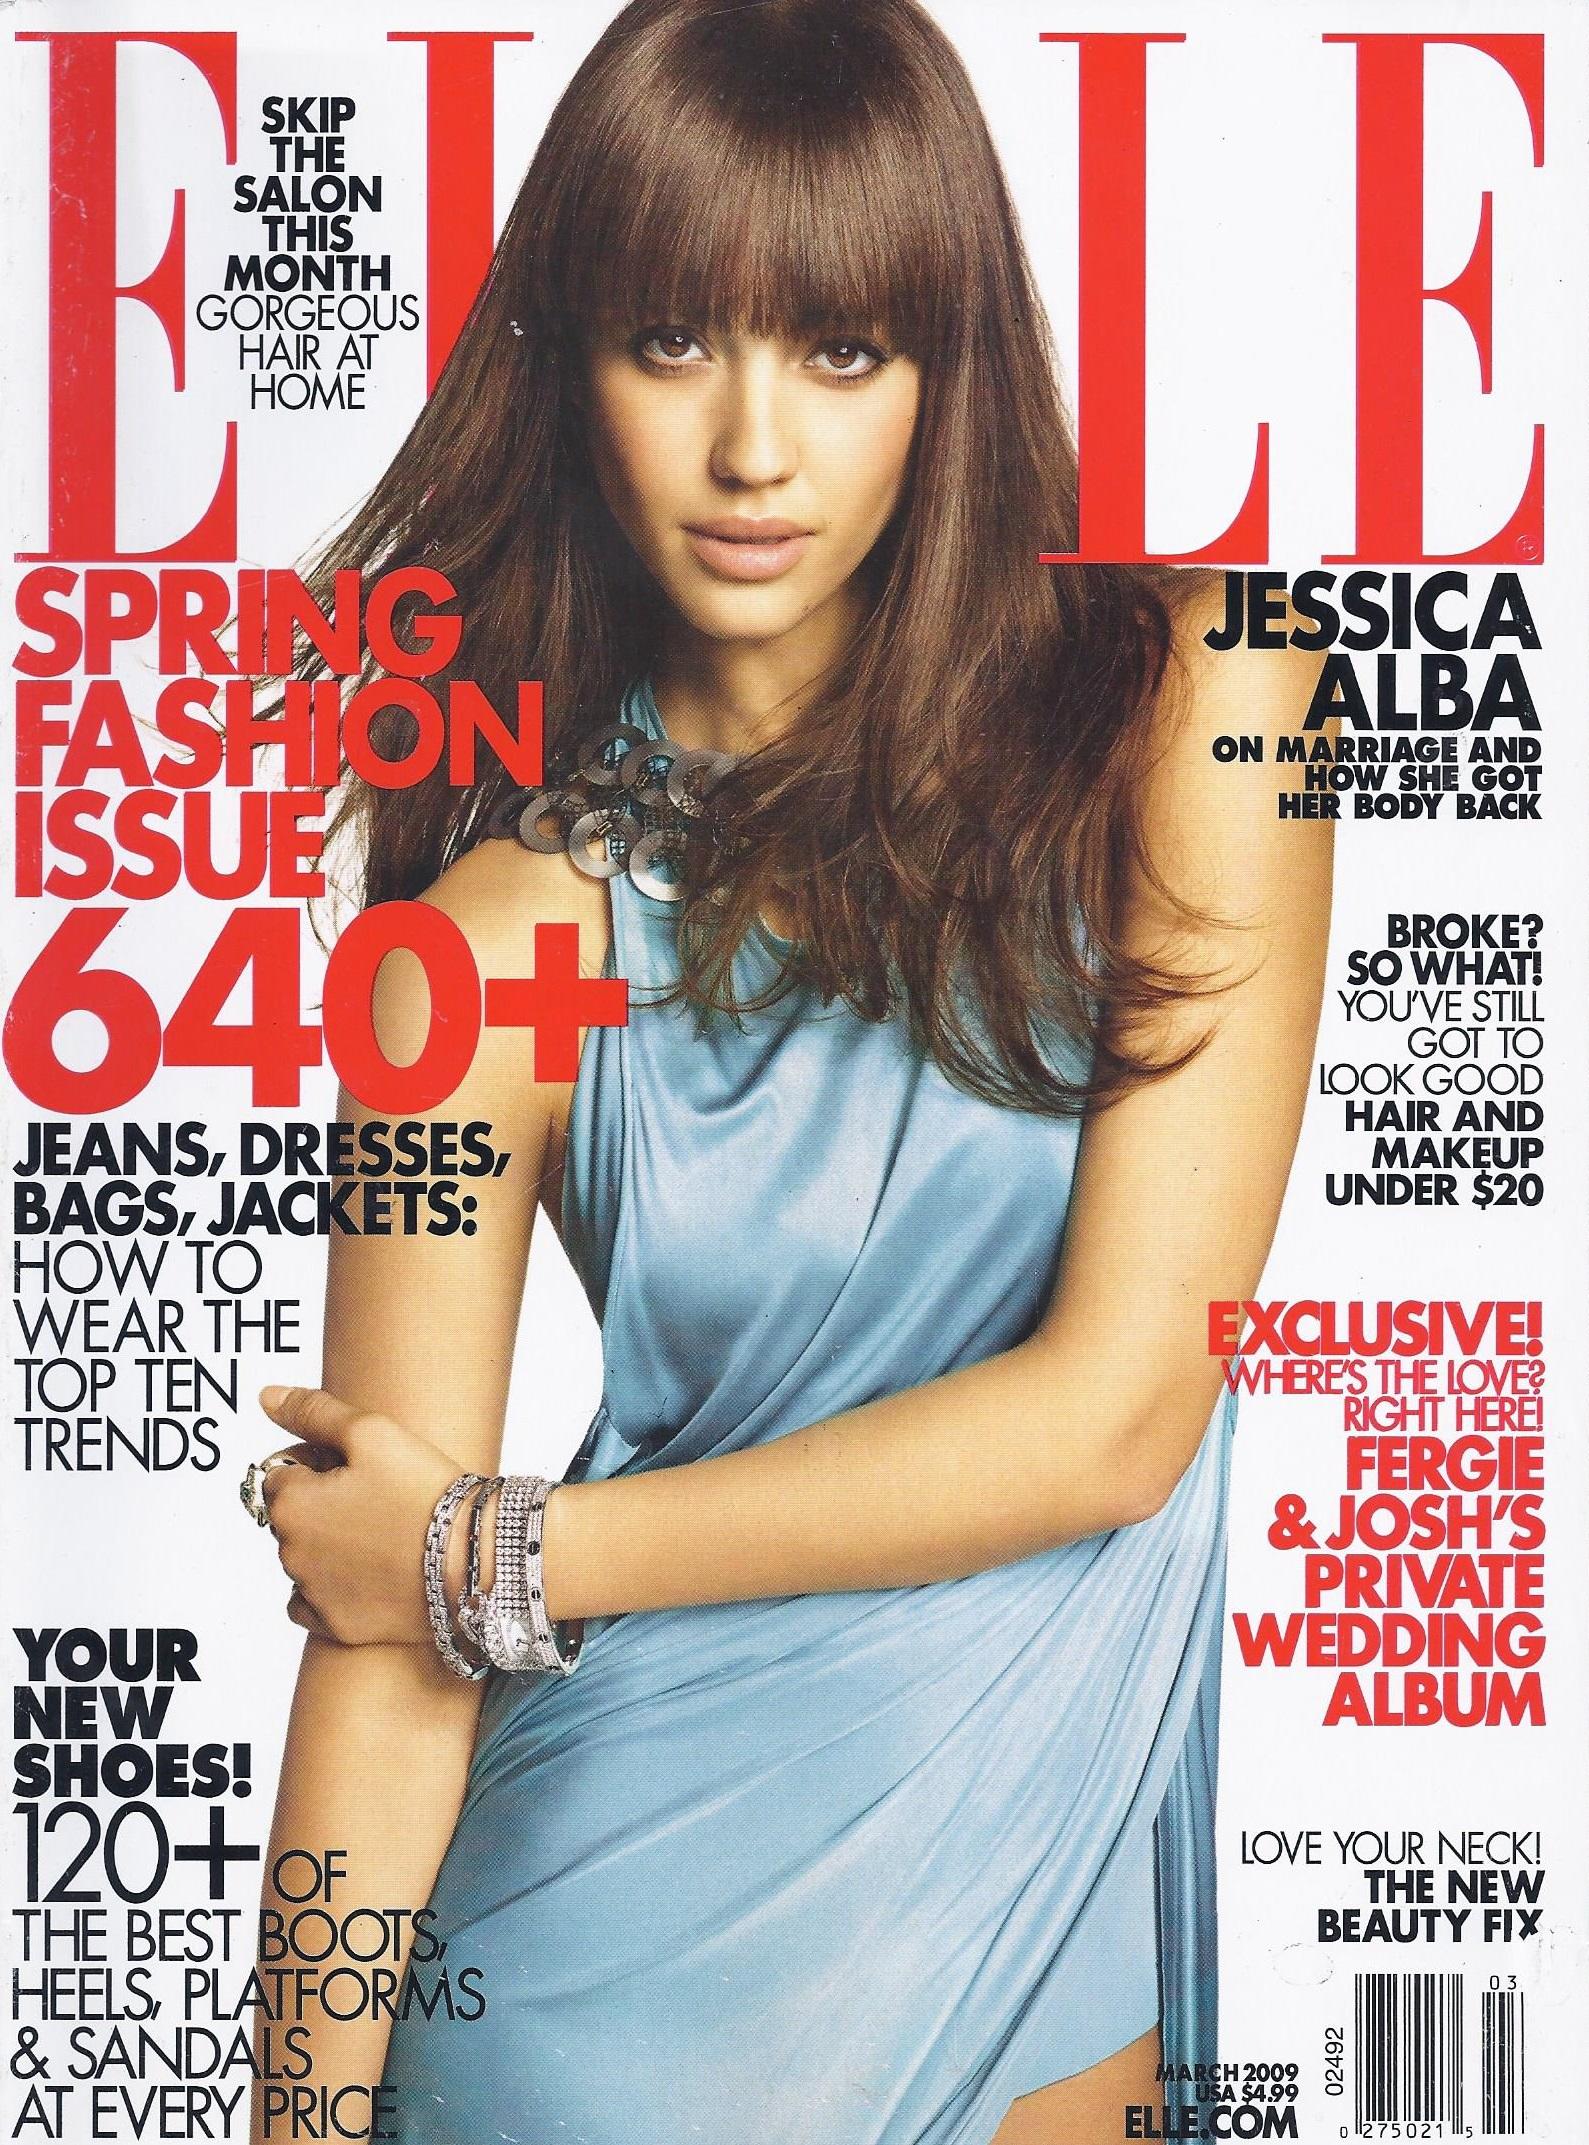 Elle Magazine Cover March 09.jpg